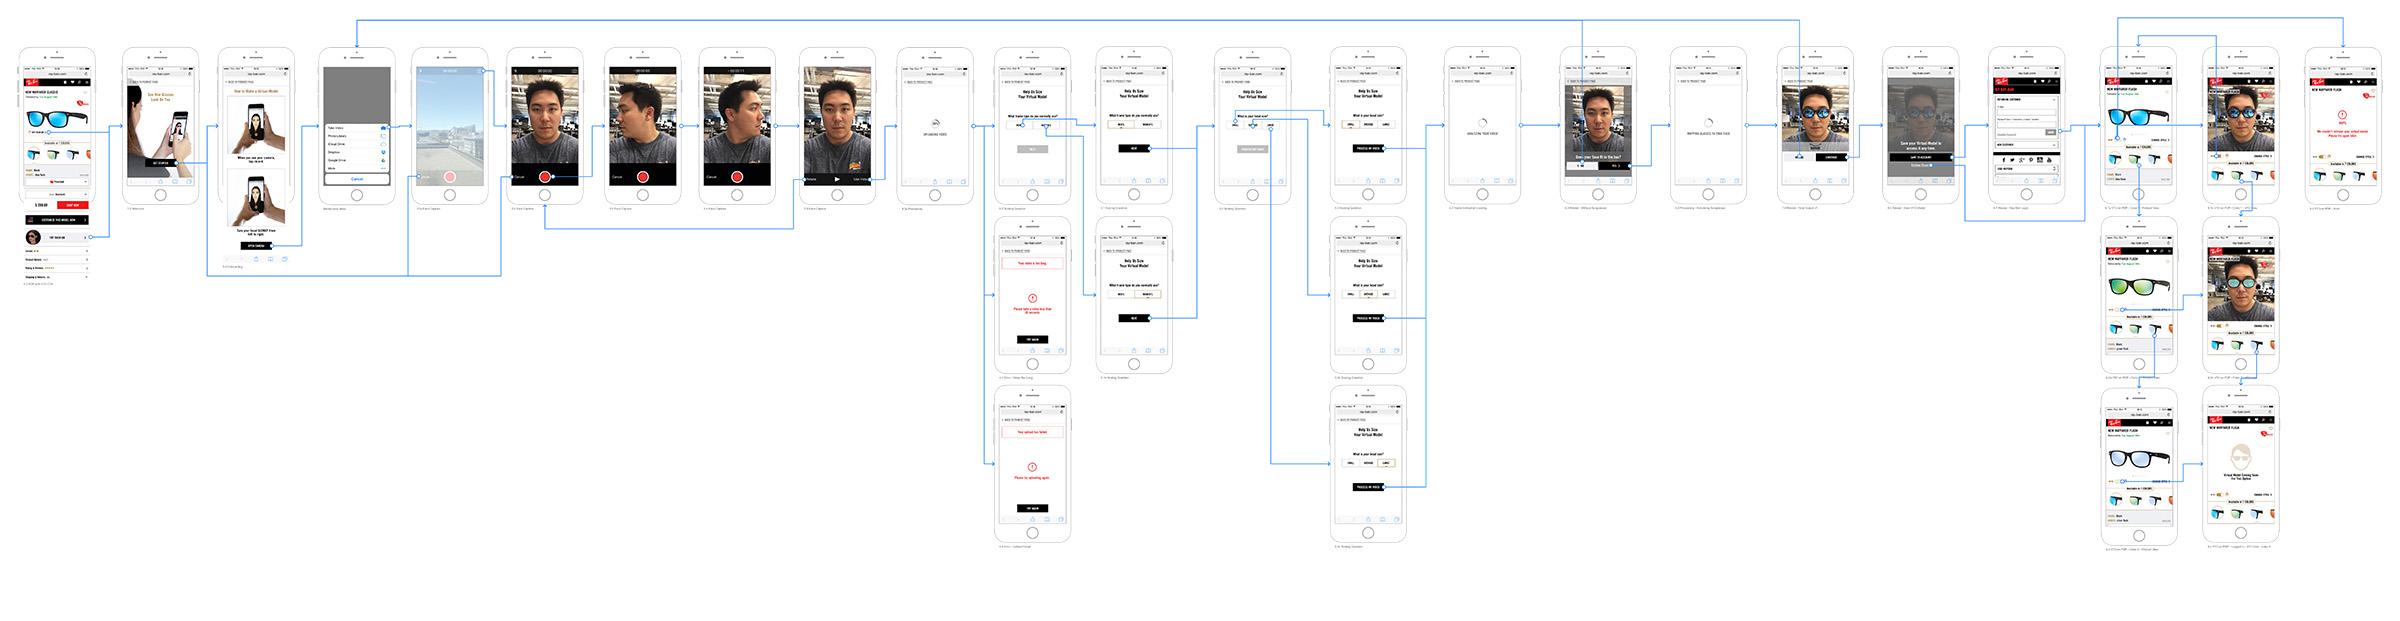 Ray-Ban Mobile VTO – Final User Flow